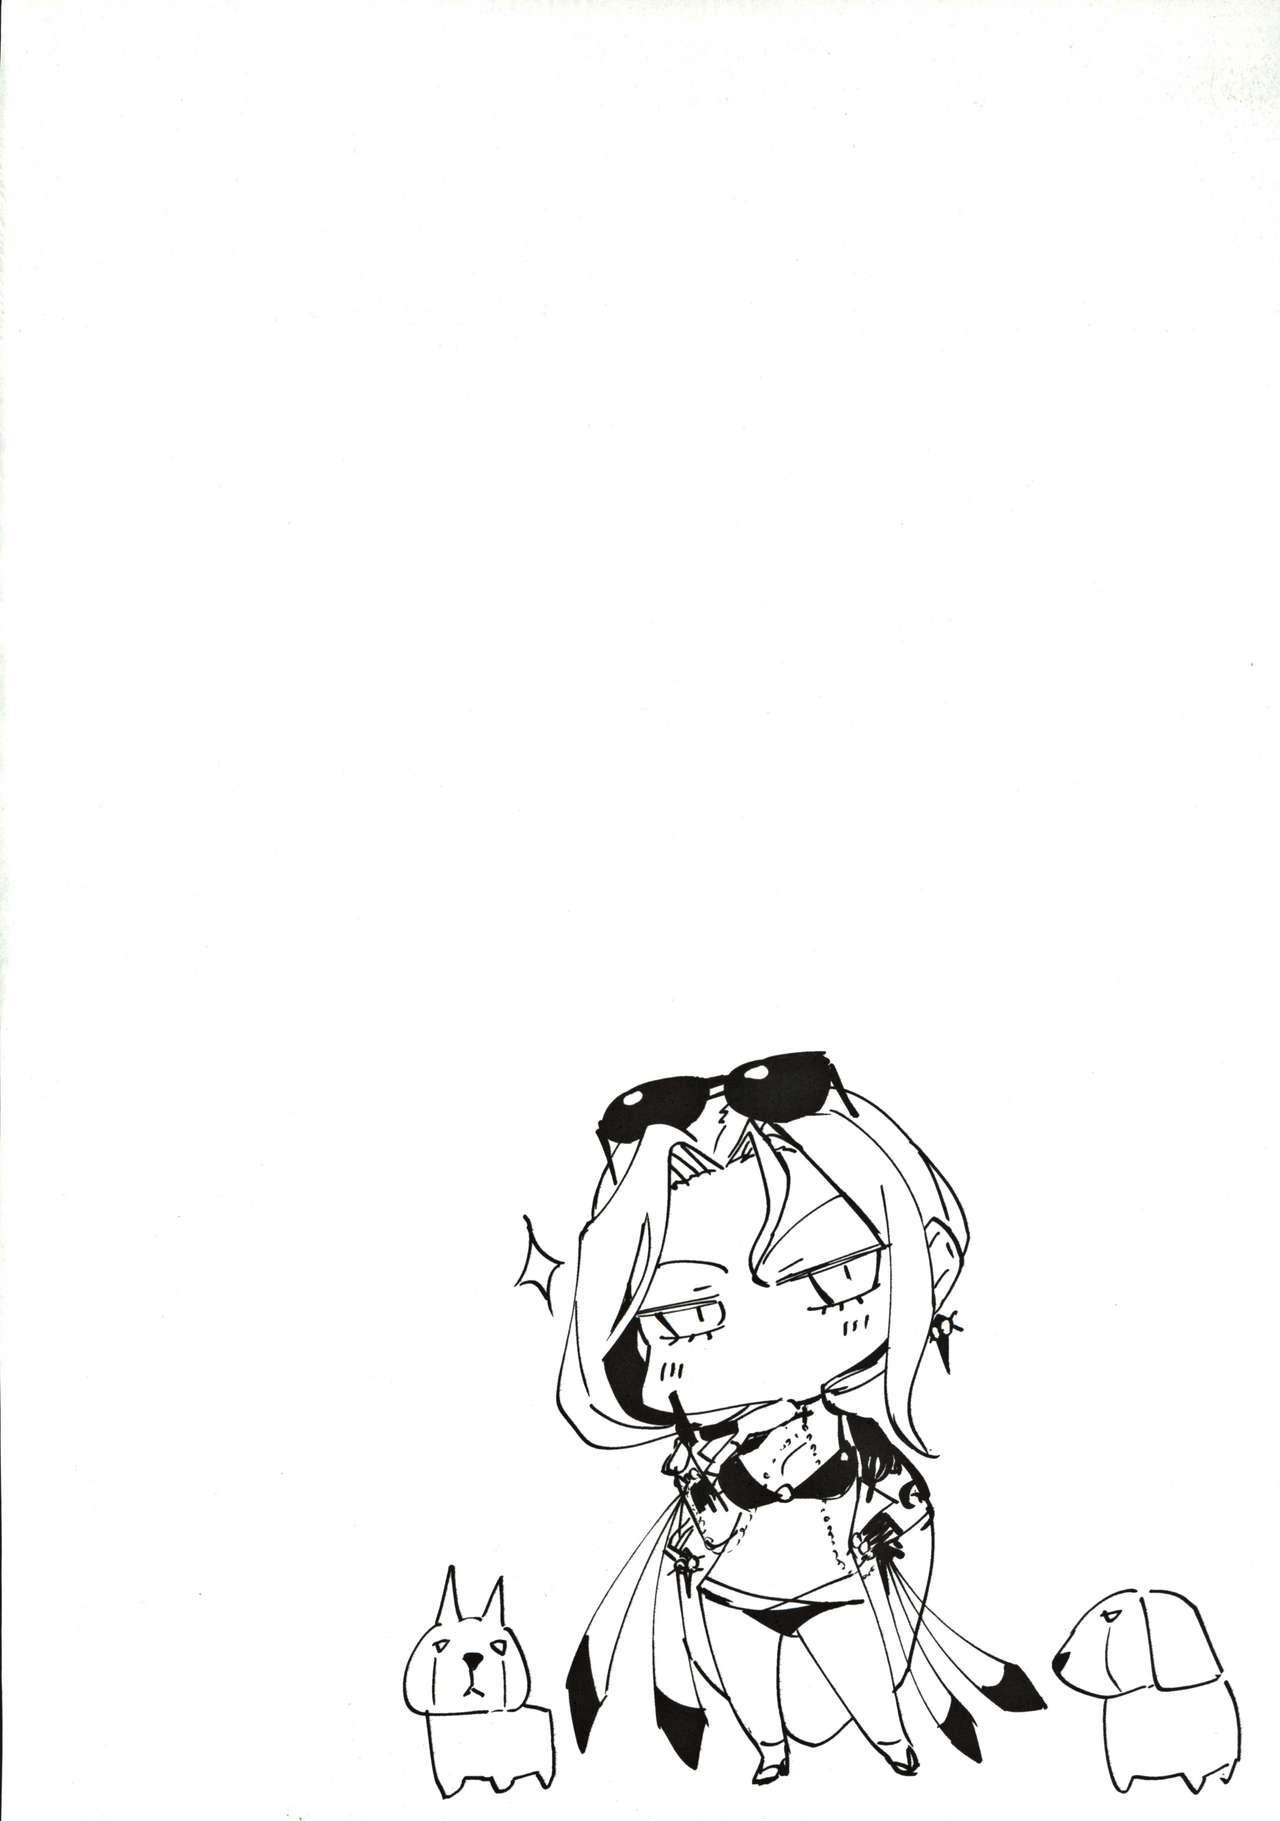 Carmilla-san no Ecchi na no ga Kakitakatta Hon 2